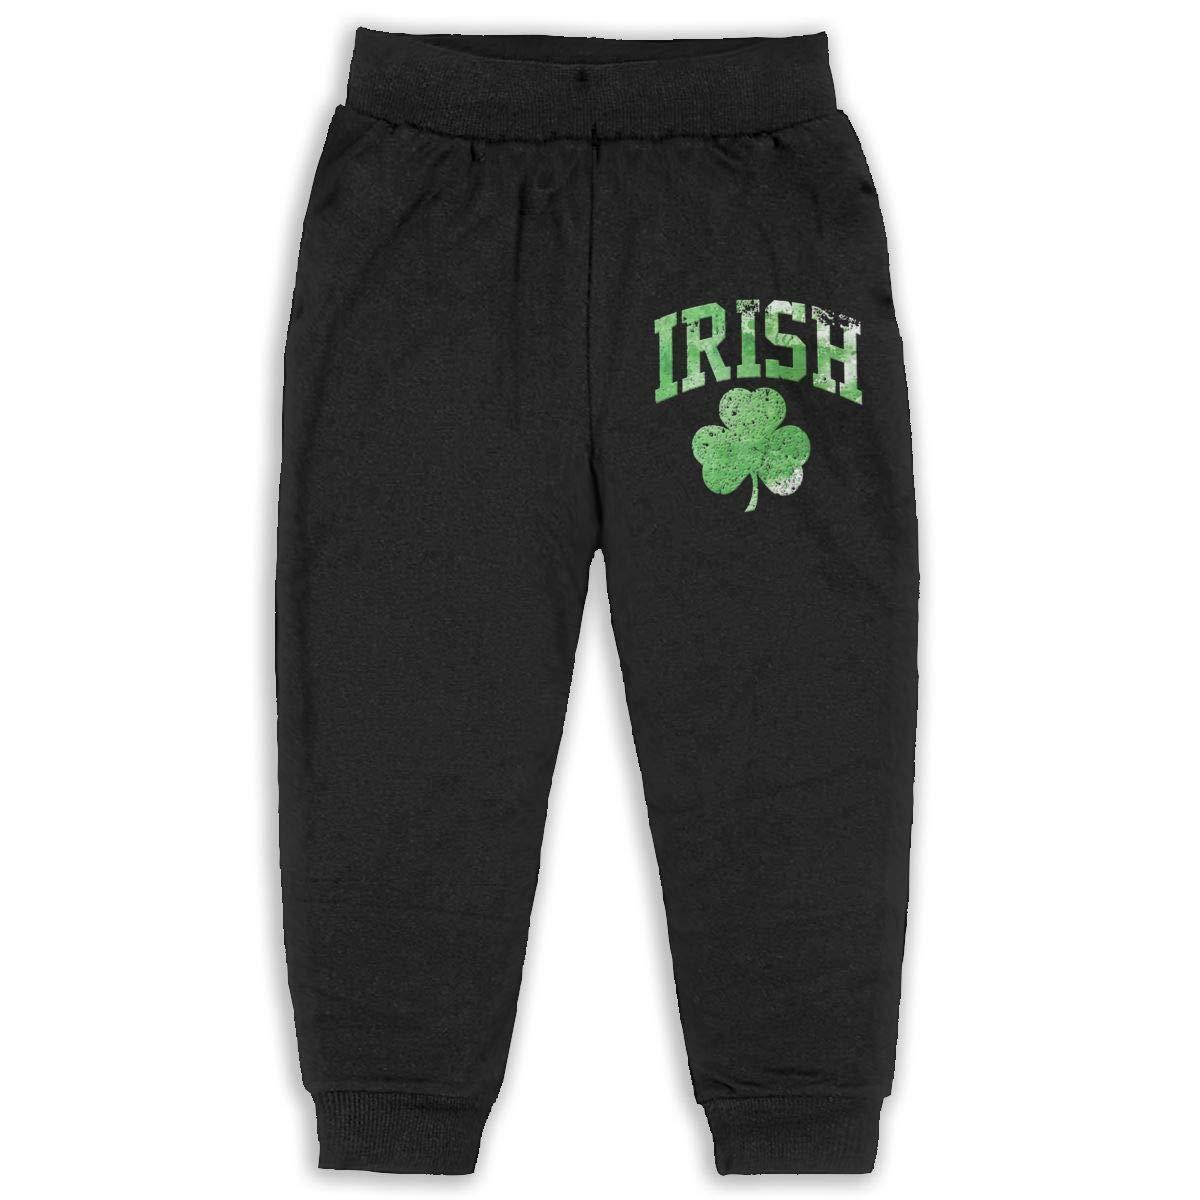 Distressed Irish St Paddys Day Shamrock Youth Soft and Cozy Sweatpants